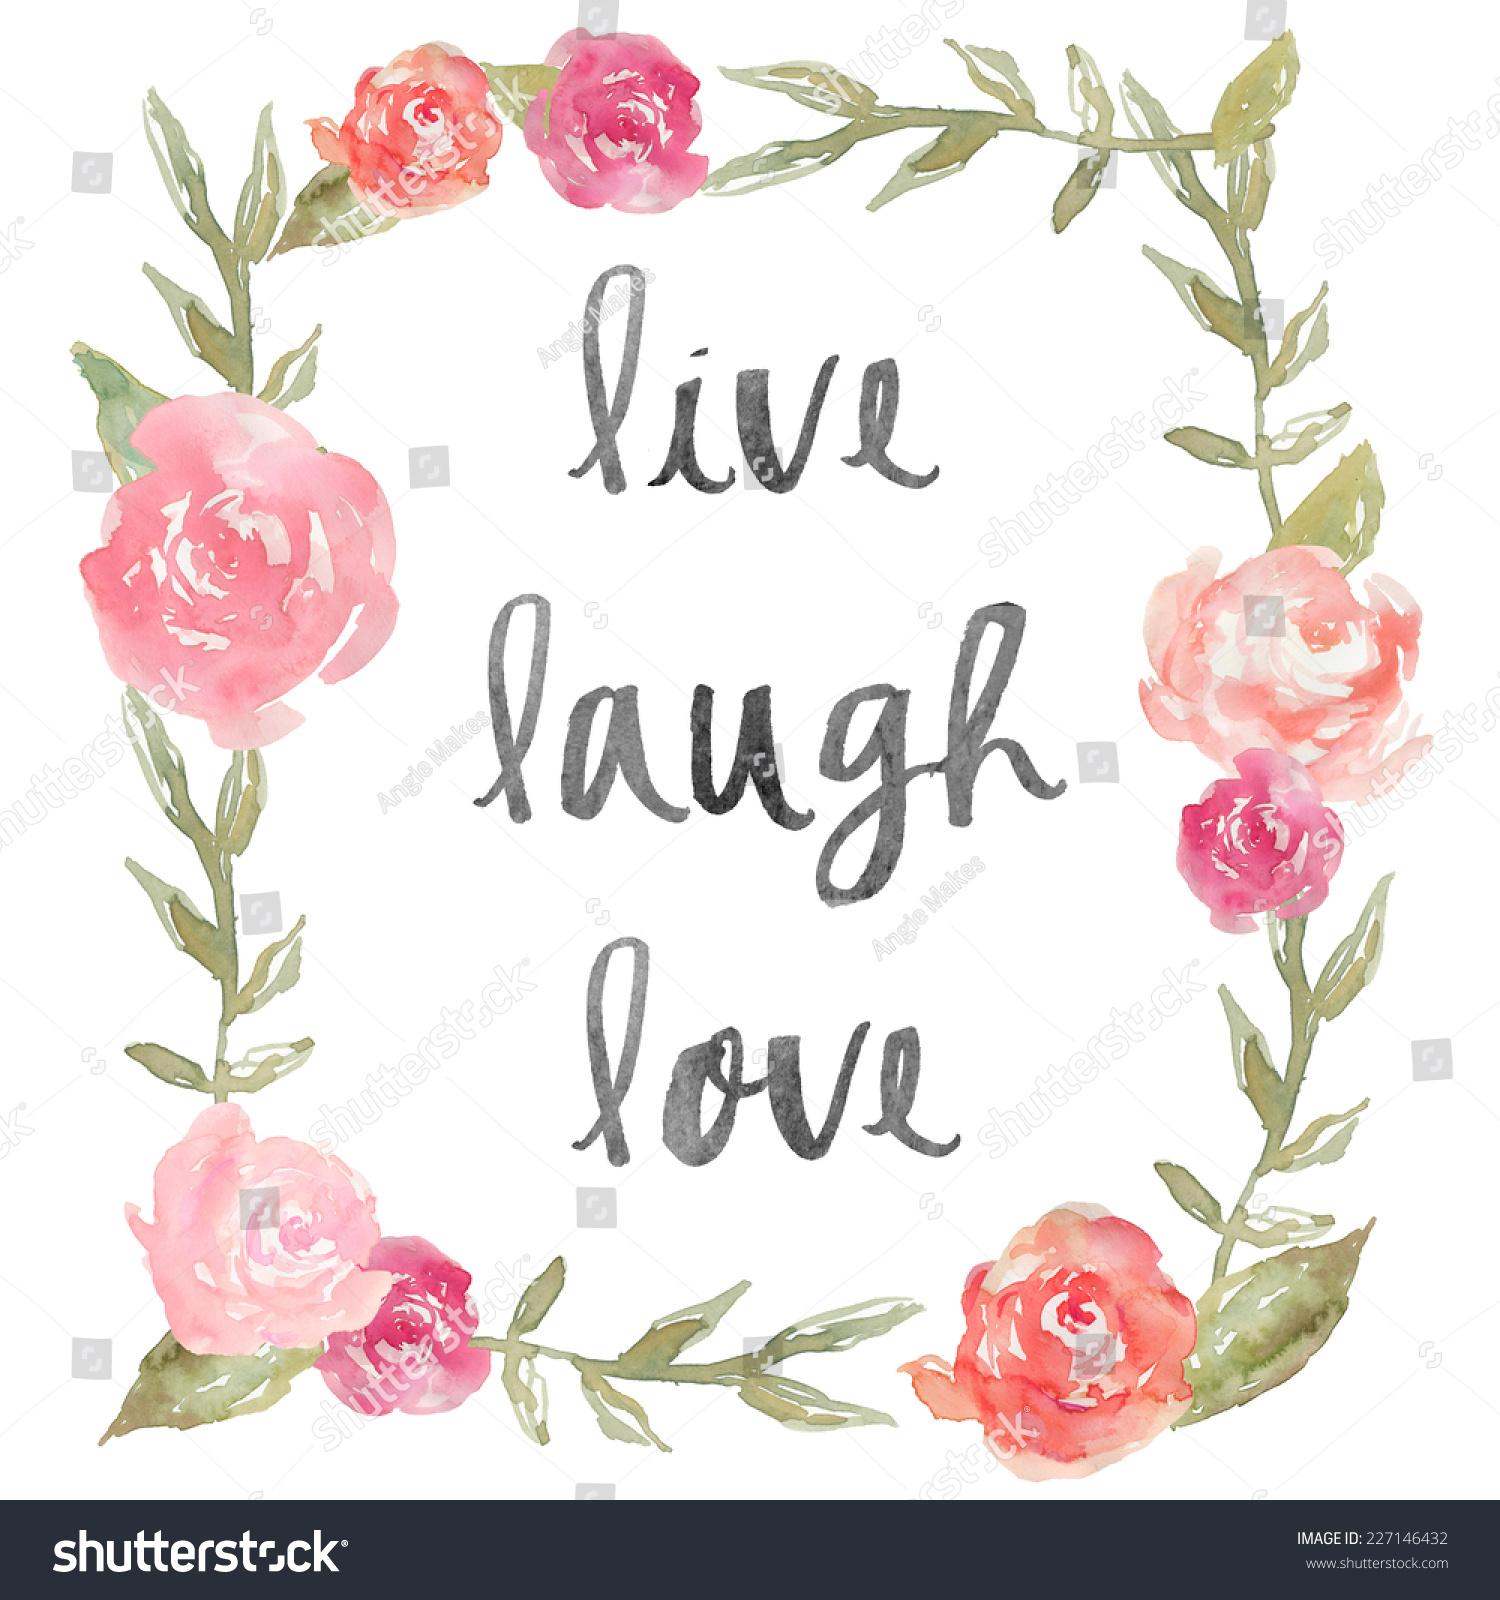 Live Laugh Love Quote Watercolor Peony Stockillustration 227146432 ...